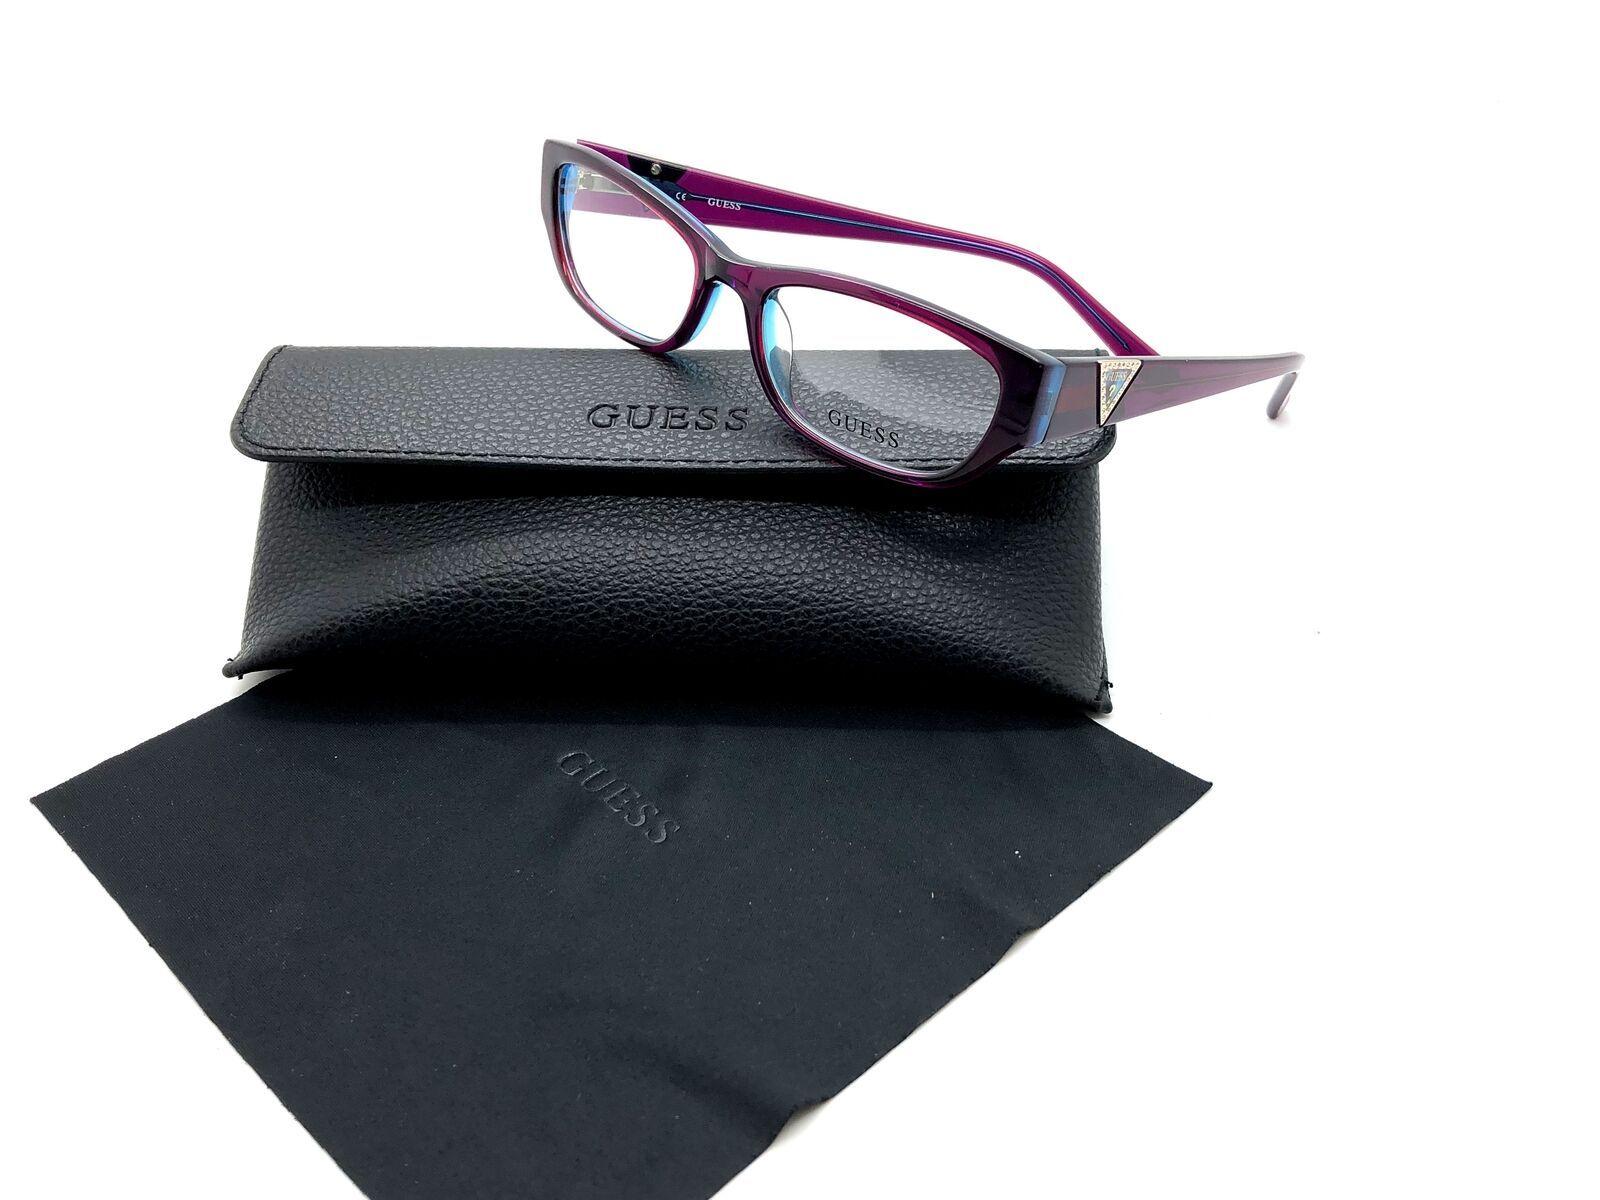 Guess Purple Eyeglasses Frame Remove Demo lenses for RX GU2387 PURBL 51MM